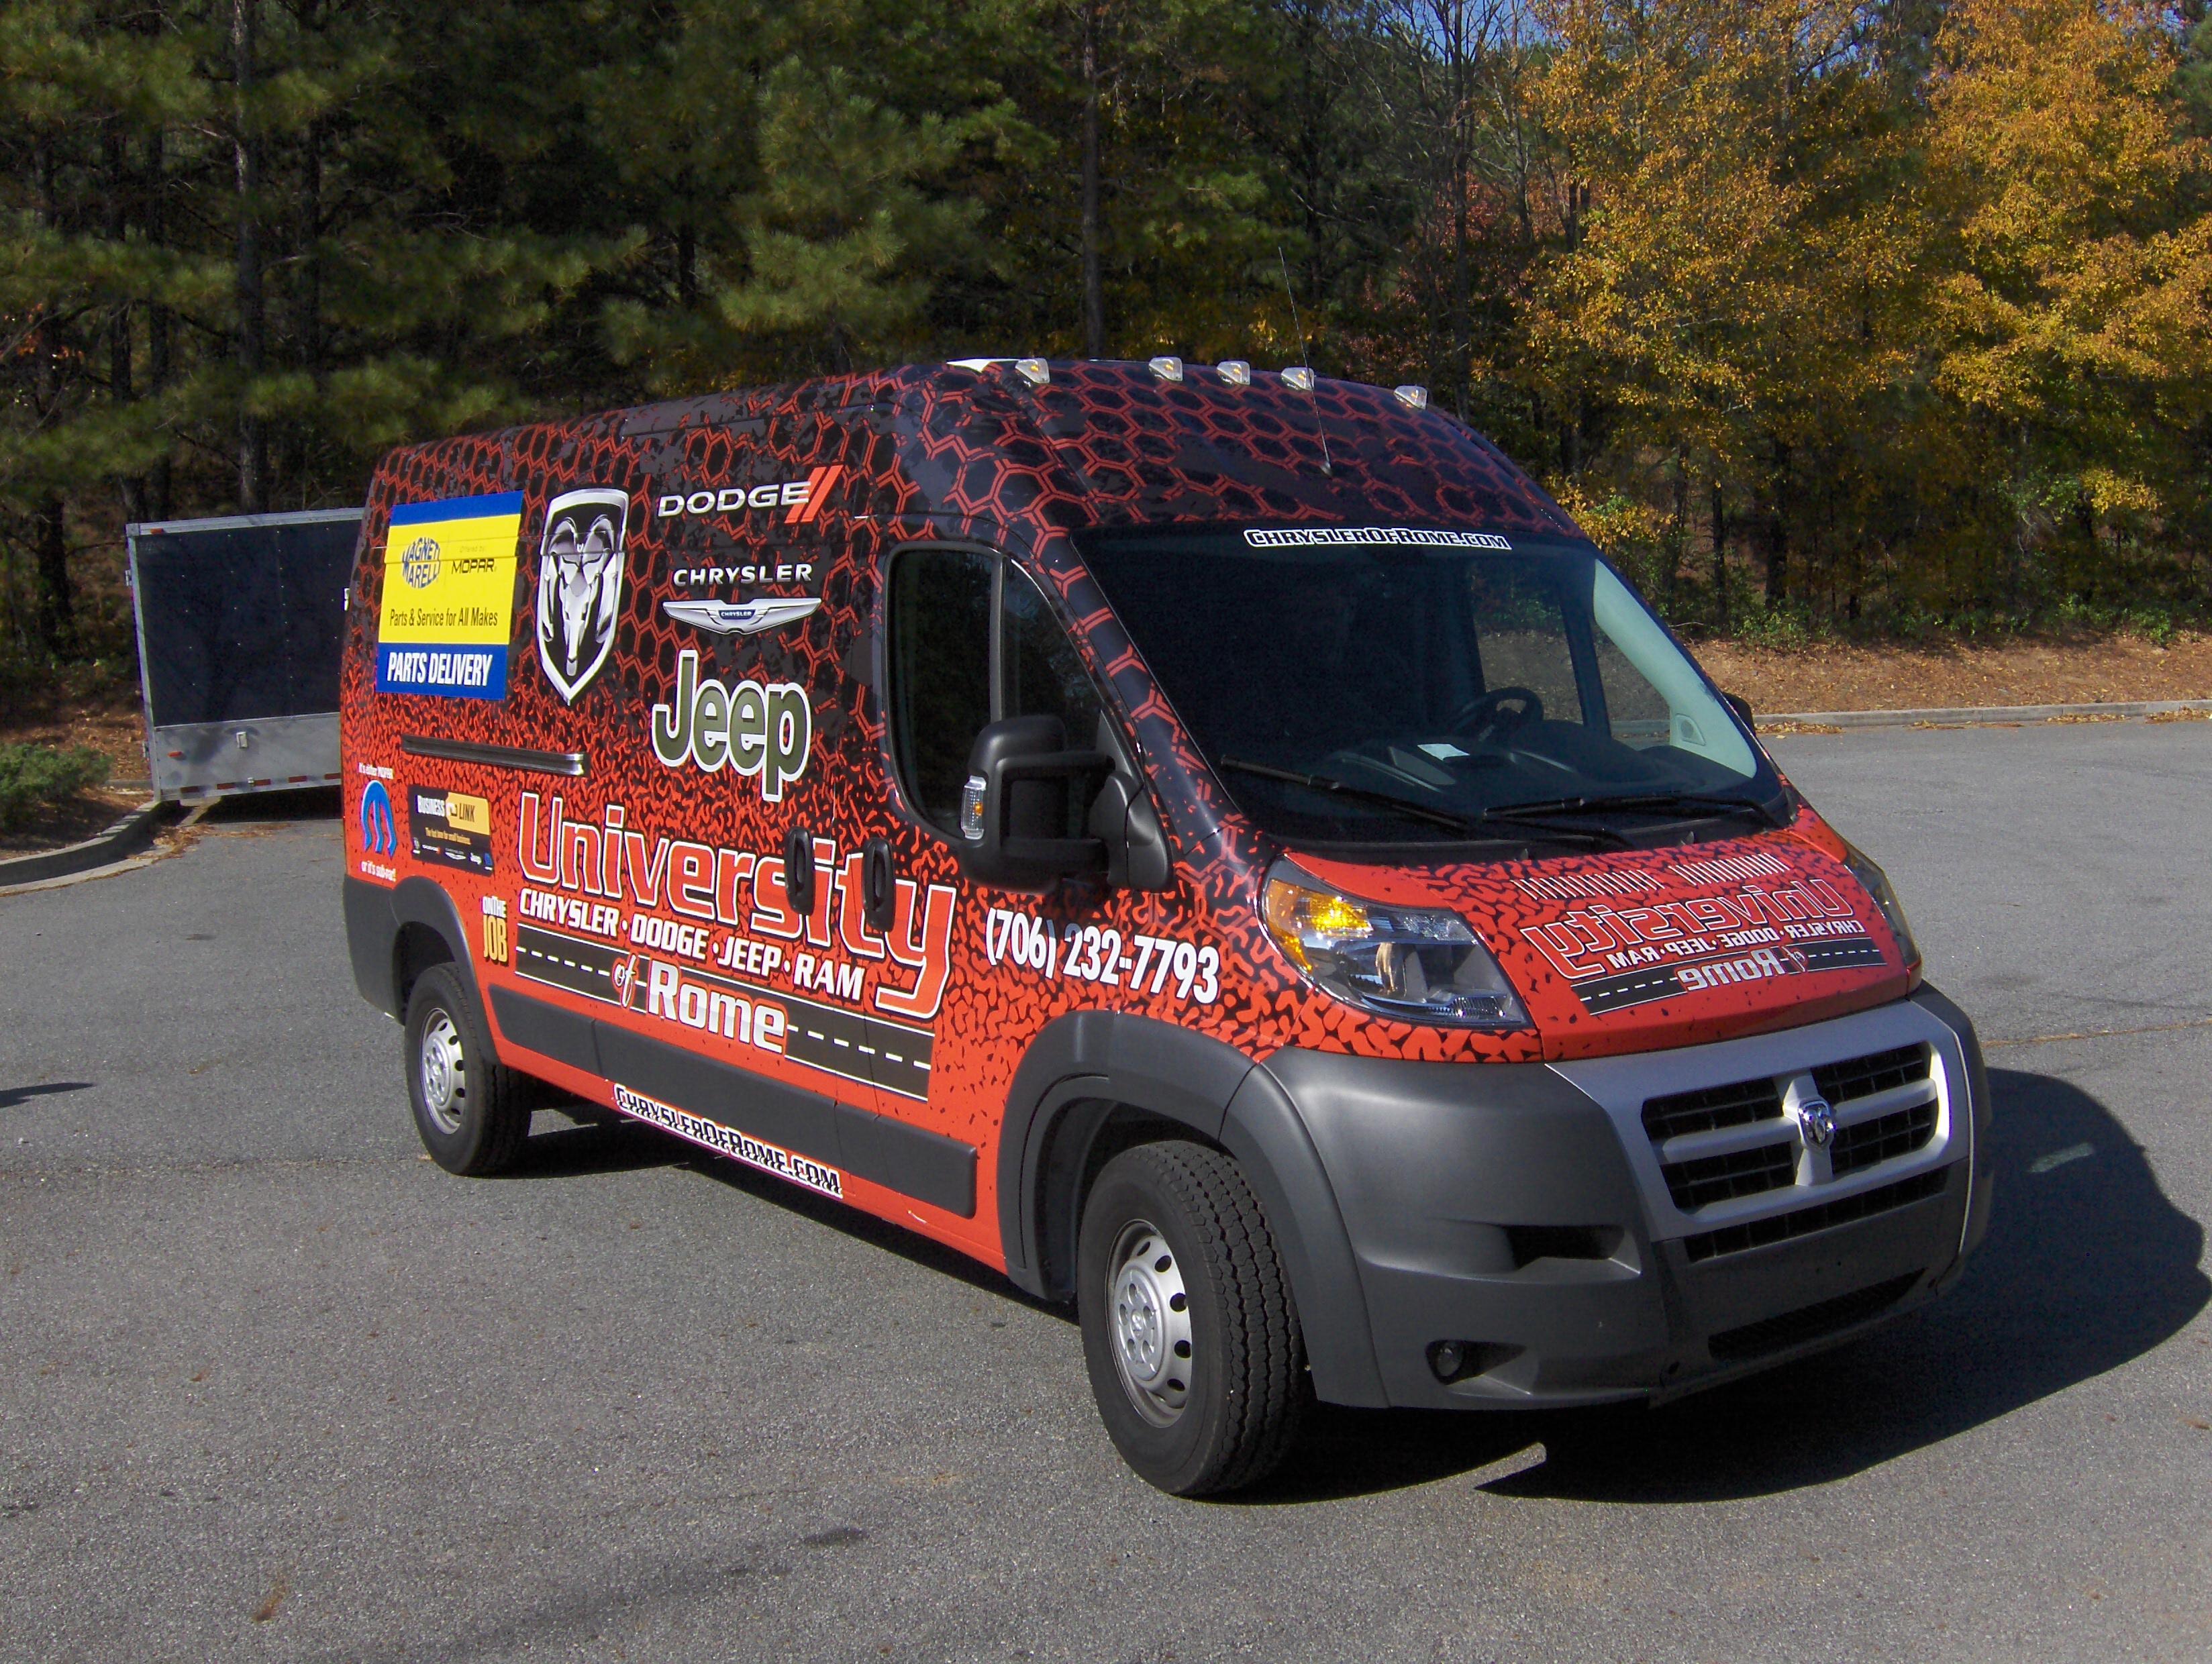 Custom Truck And Van Wraps In Rome Ga For University